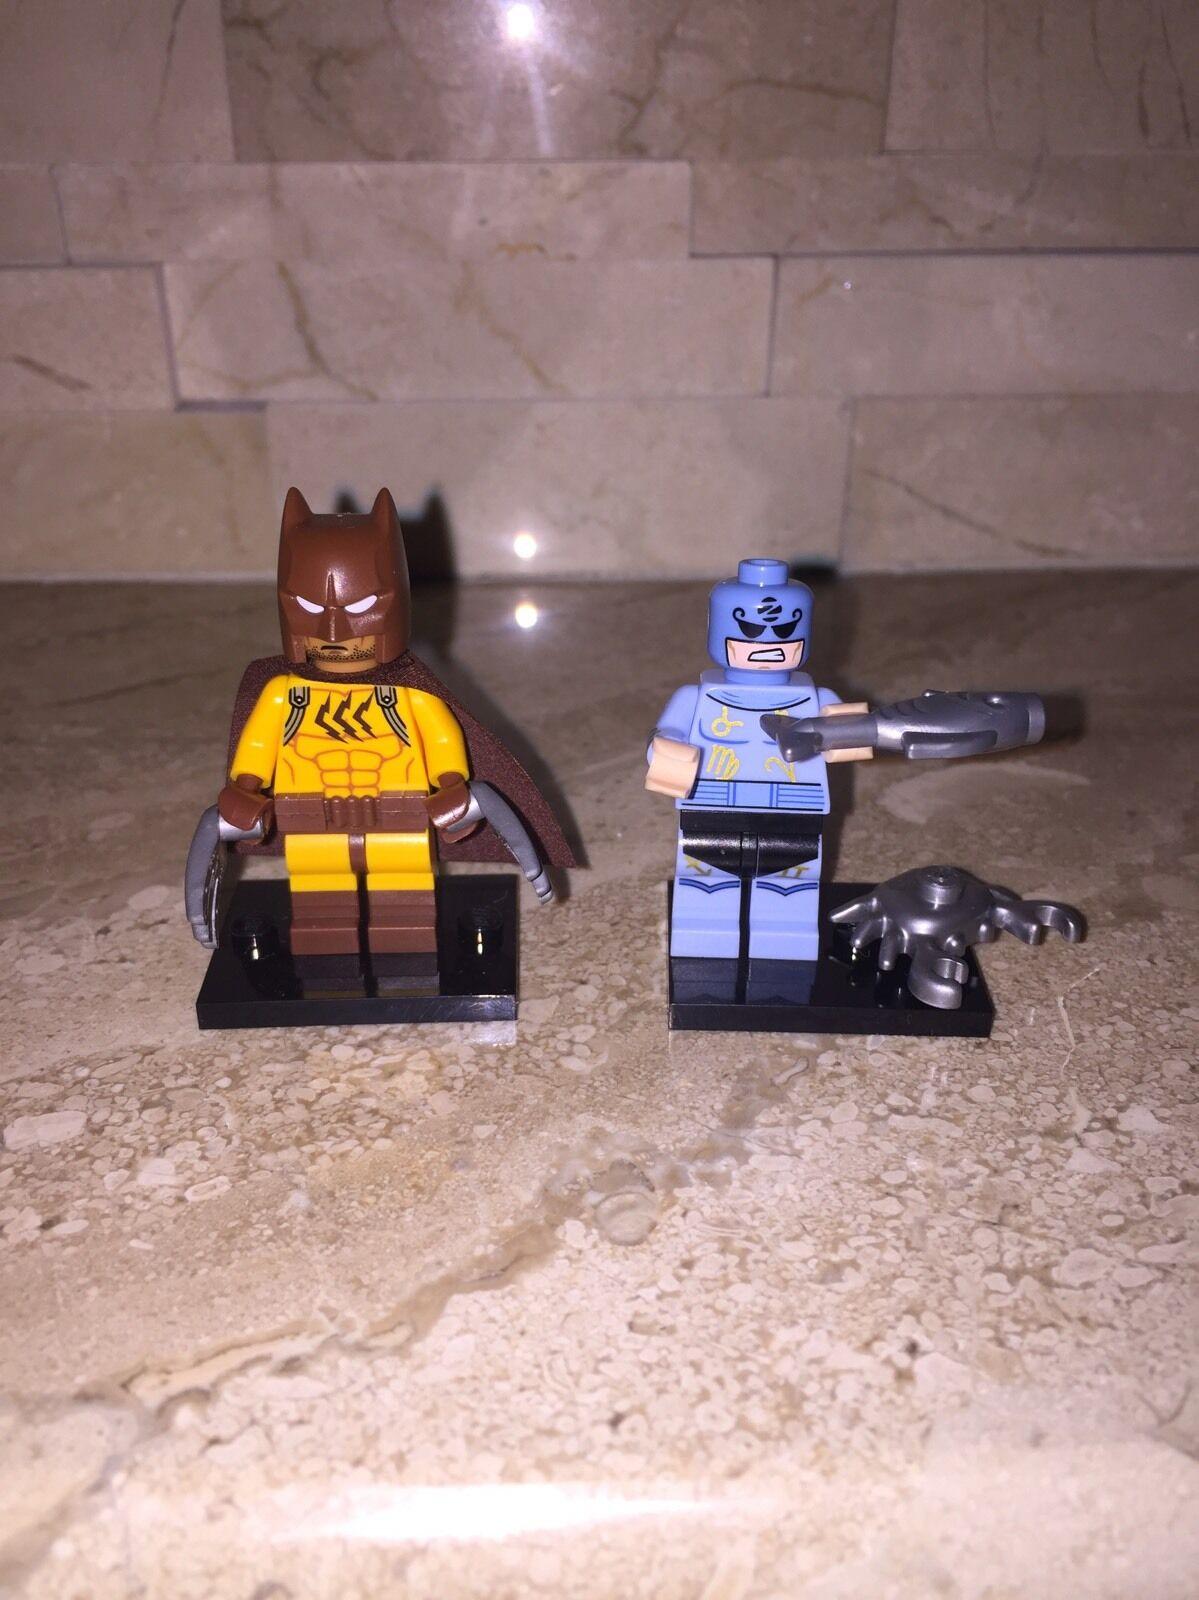 LEGO THE BATMAN MOVIE MINIFIGURE MASTER SET OF 2 ZODIAC MASTER MINIFIGURE & BATMAN CATMAN 5d8575